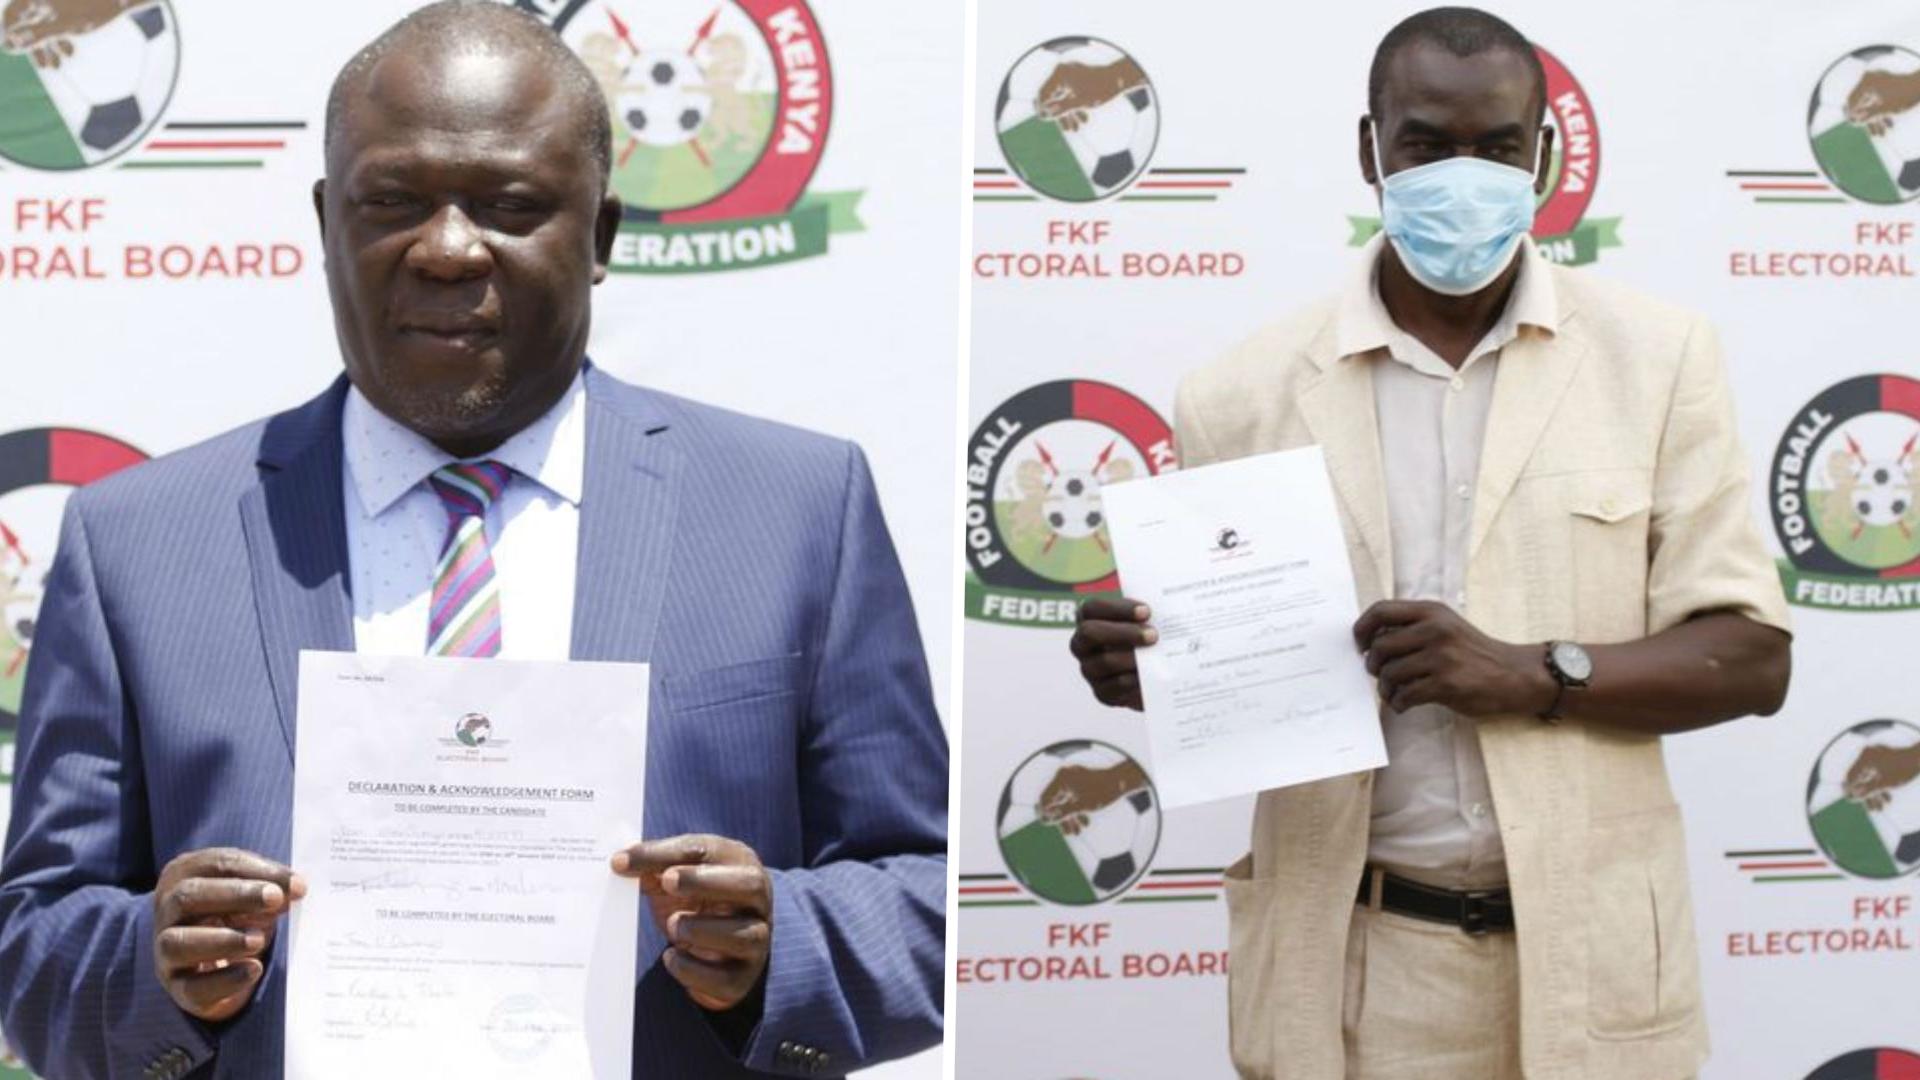 FKF Elections: Alila, Aduda hit back against Nyamweya and company